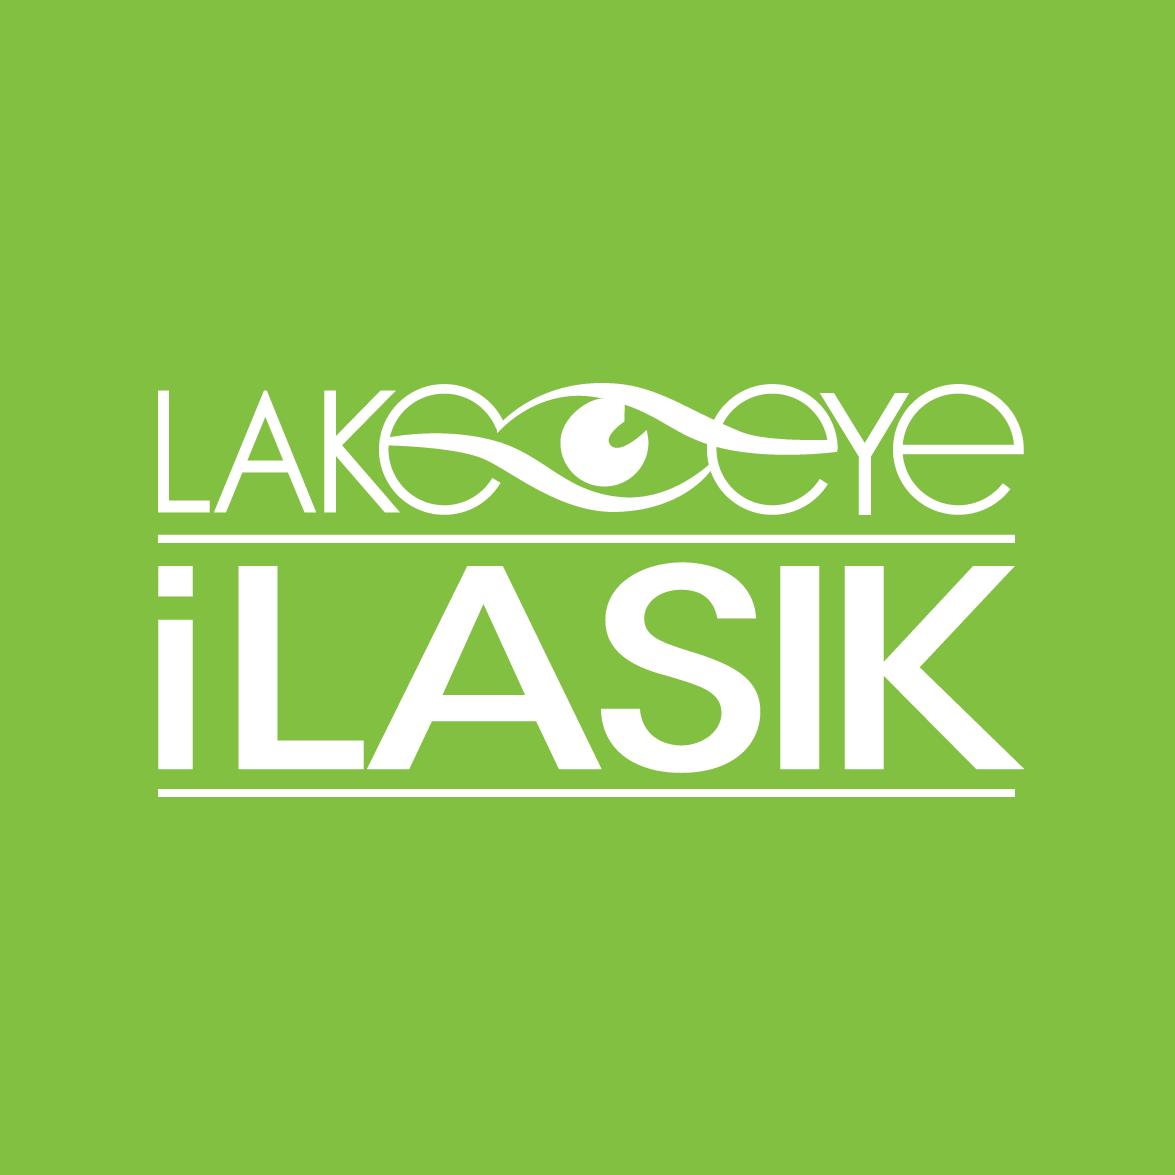 LEYE iLasik logo